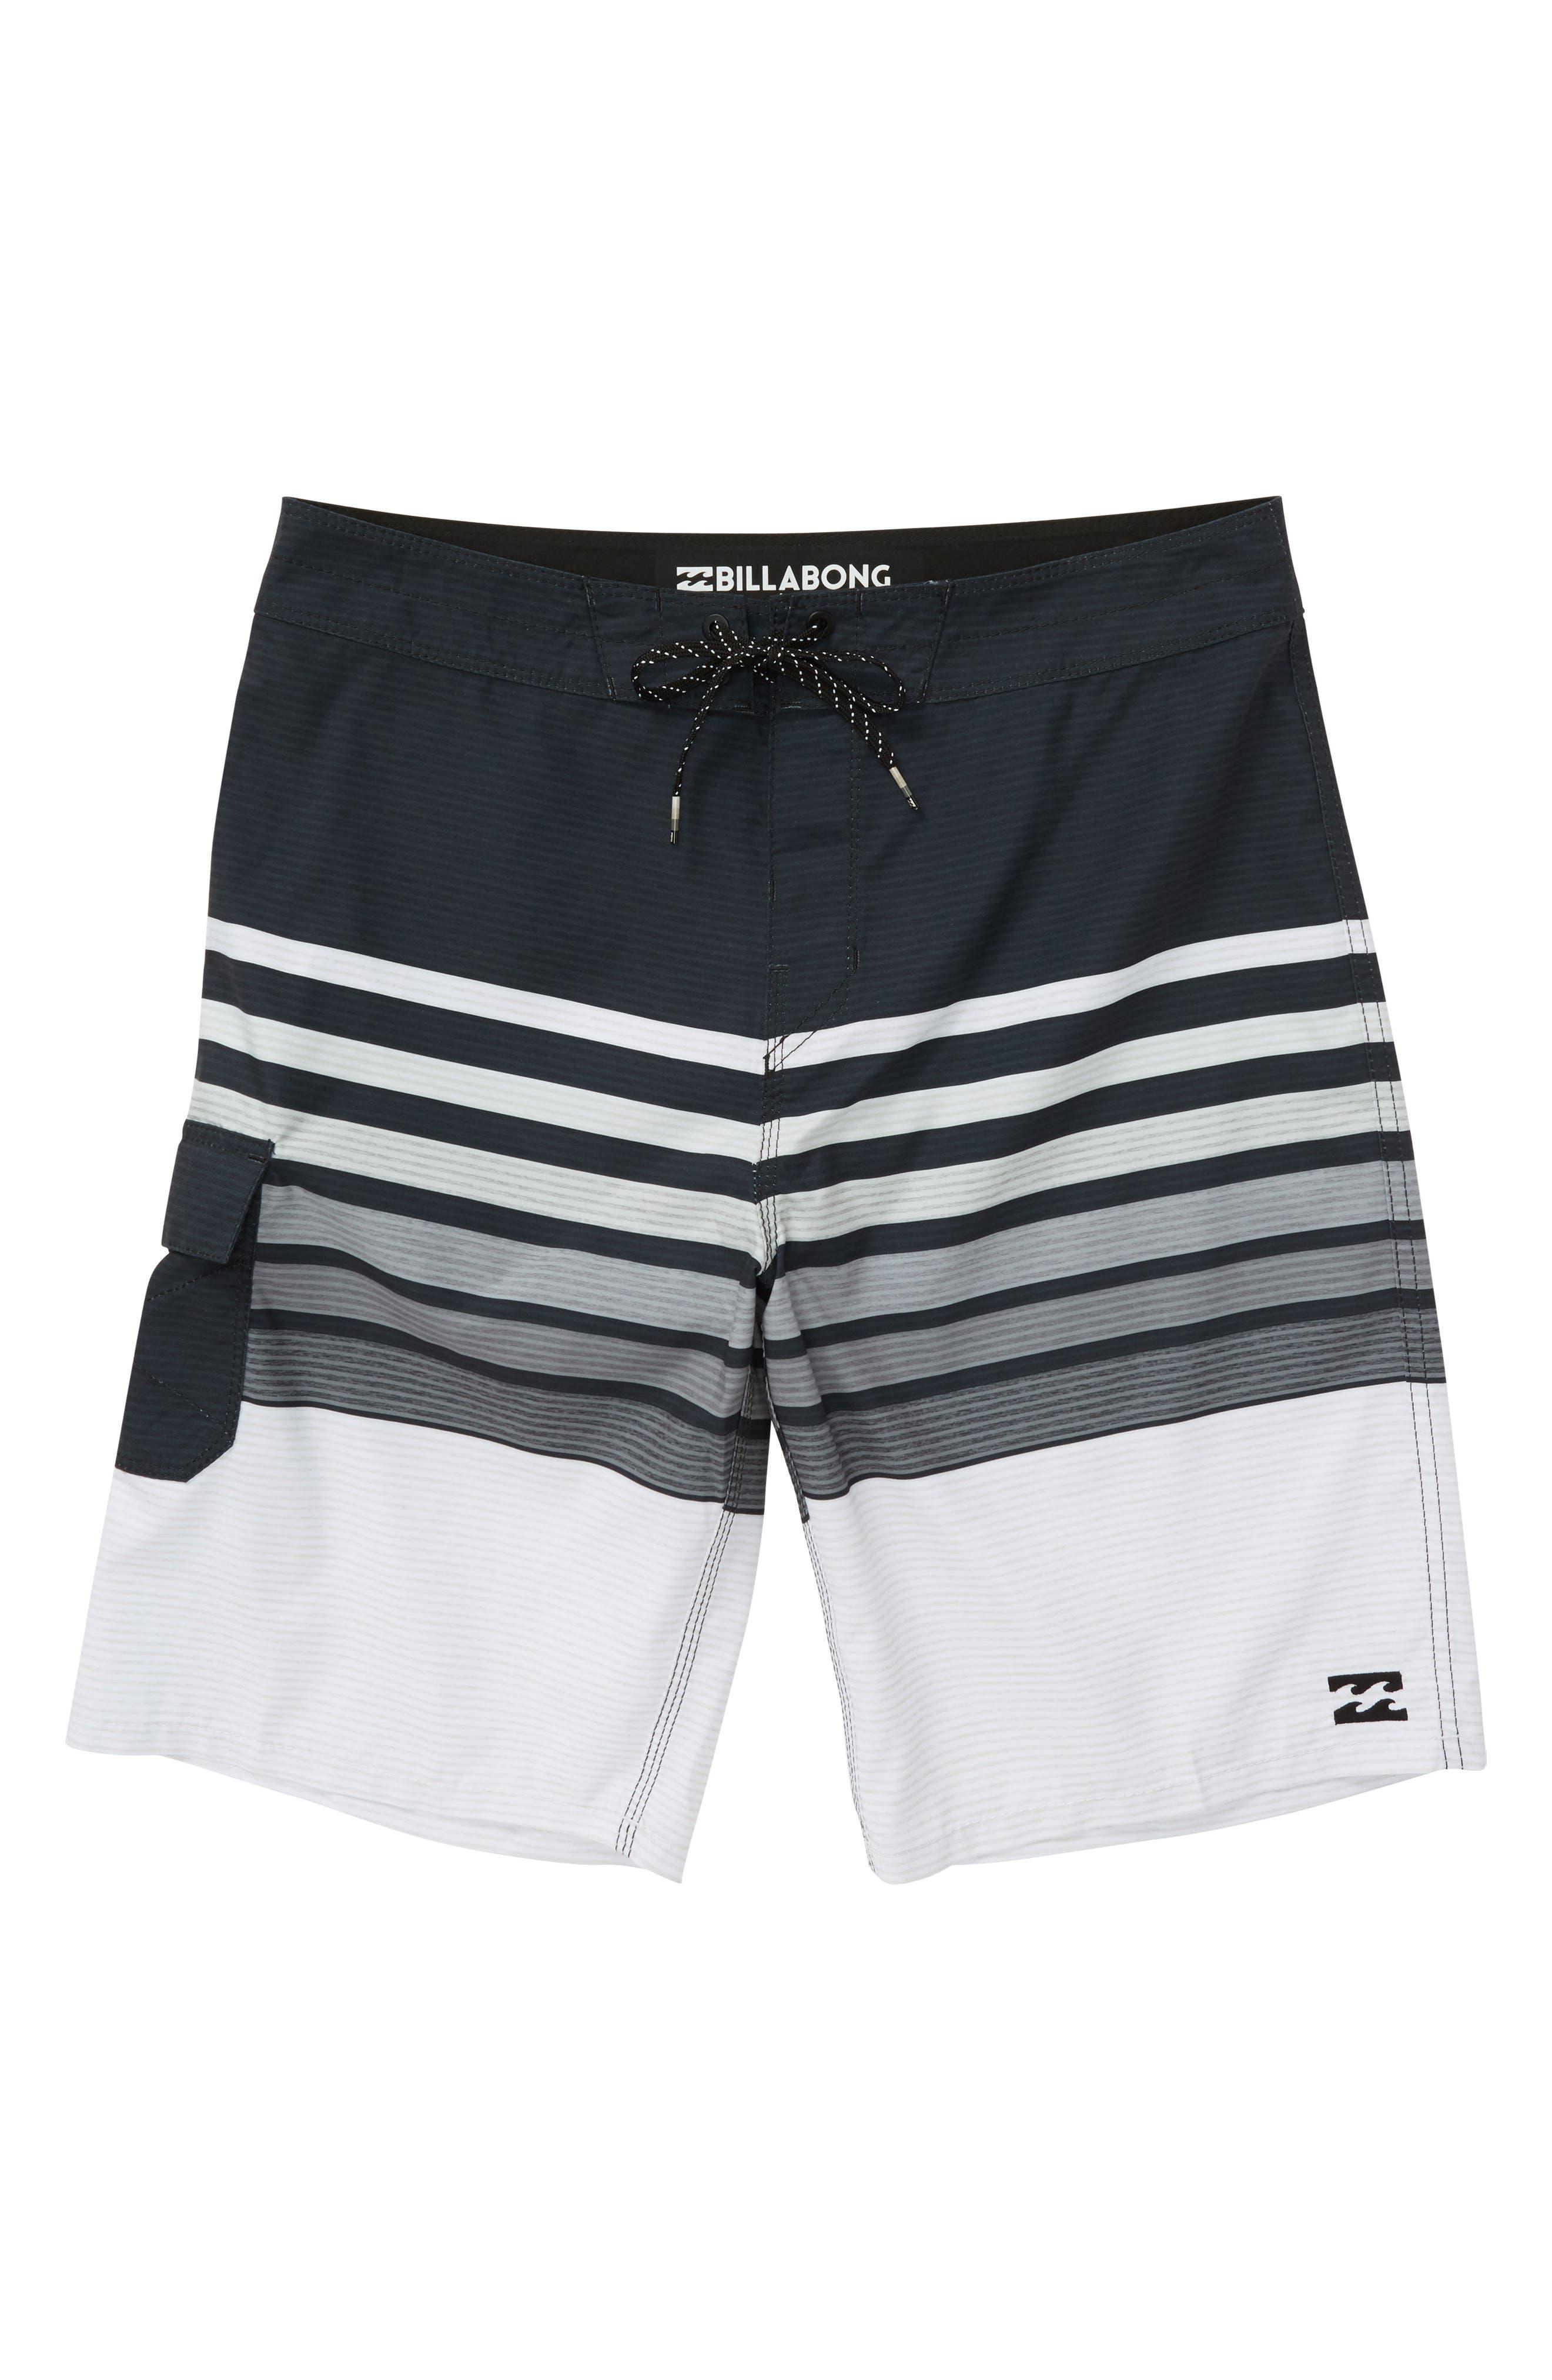 All Day OG Stripe Board Shorts,                             Main thumbnail 1, color,                             Black